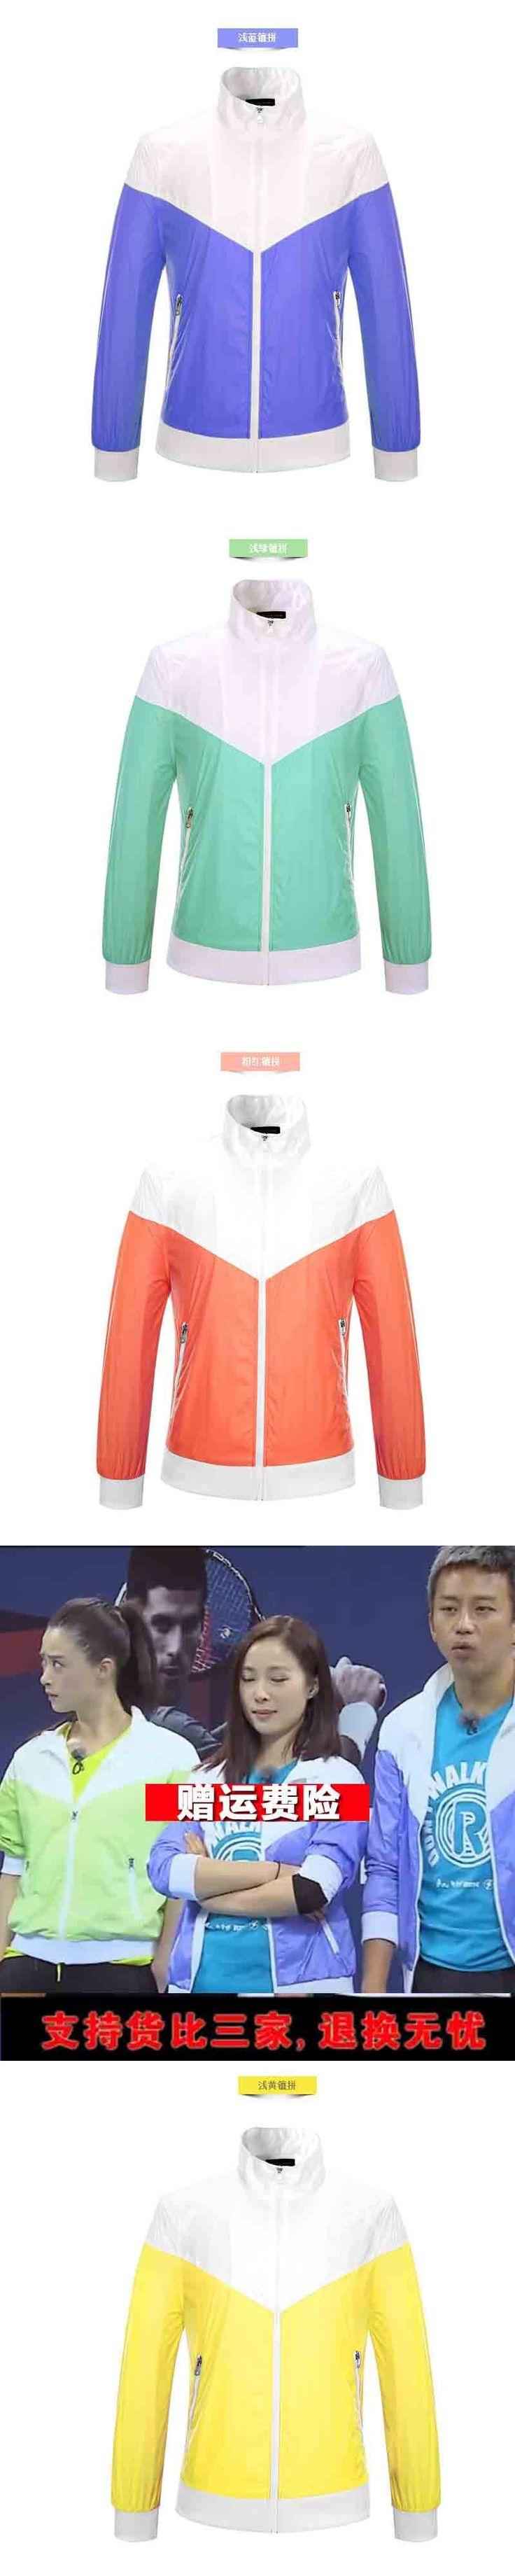 China Star same style Women Men Ultra-light Waterproof Jacket Quick-dry Outwear 4 Colors Plus Size S-XXL